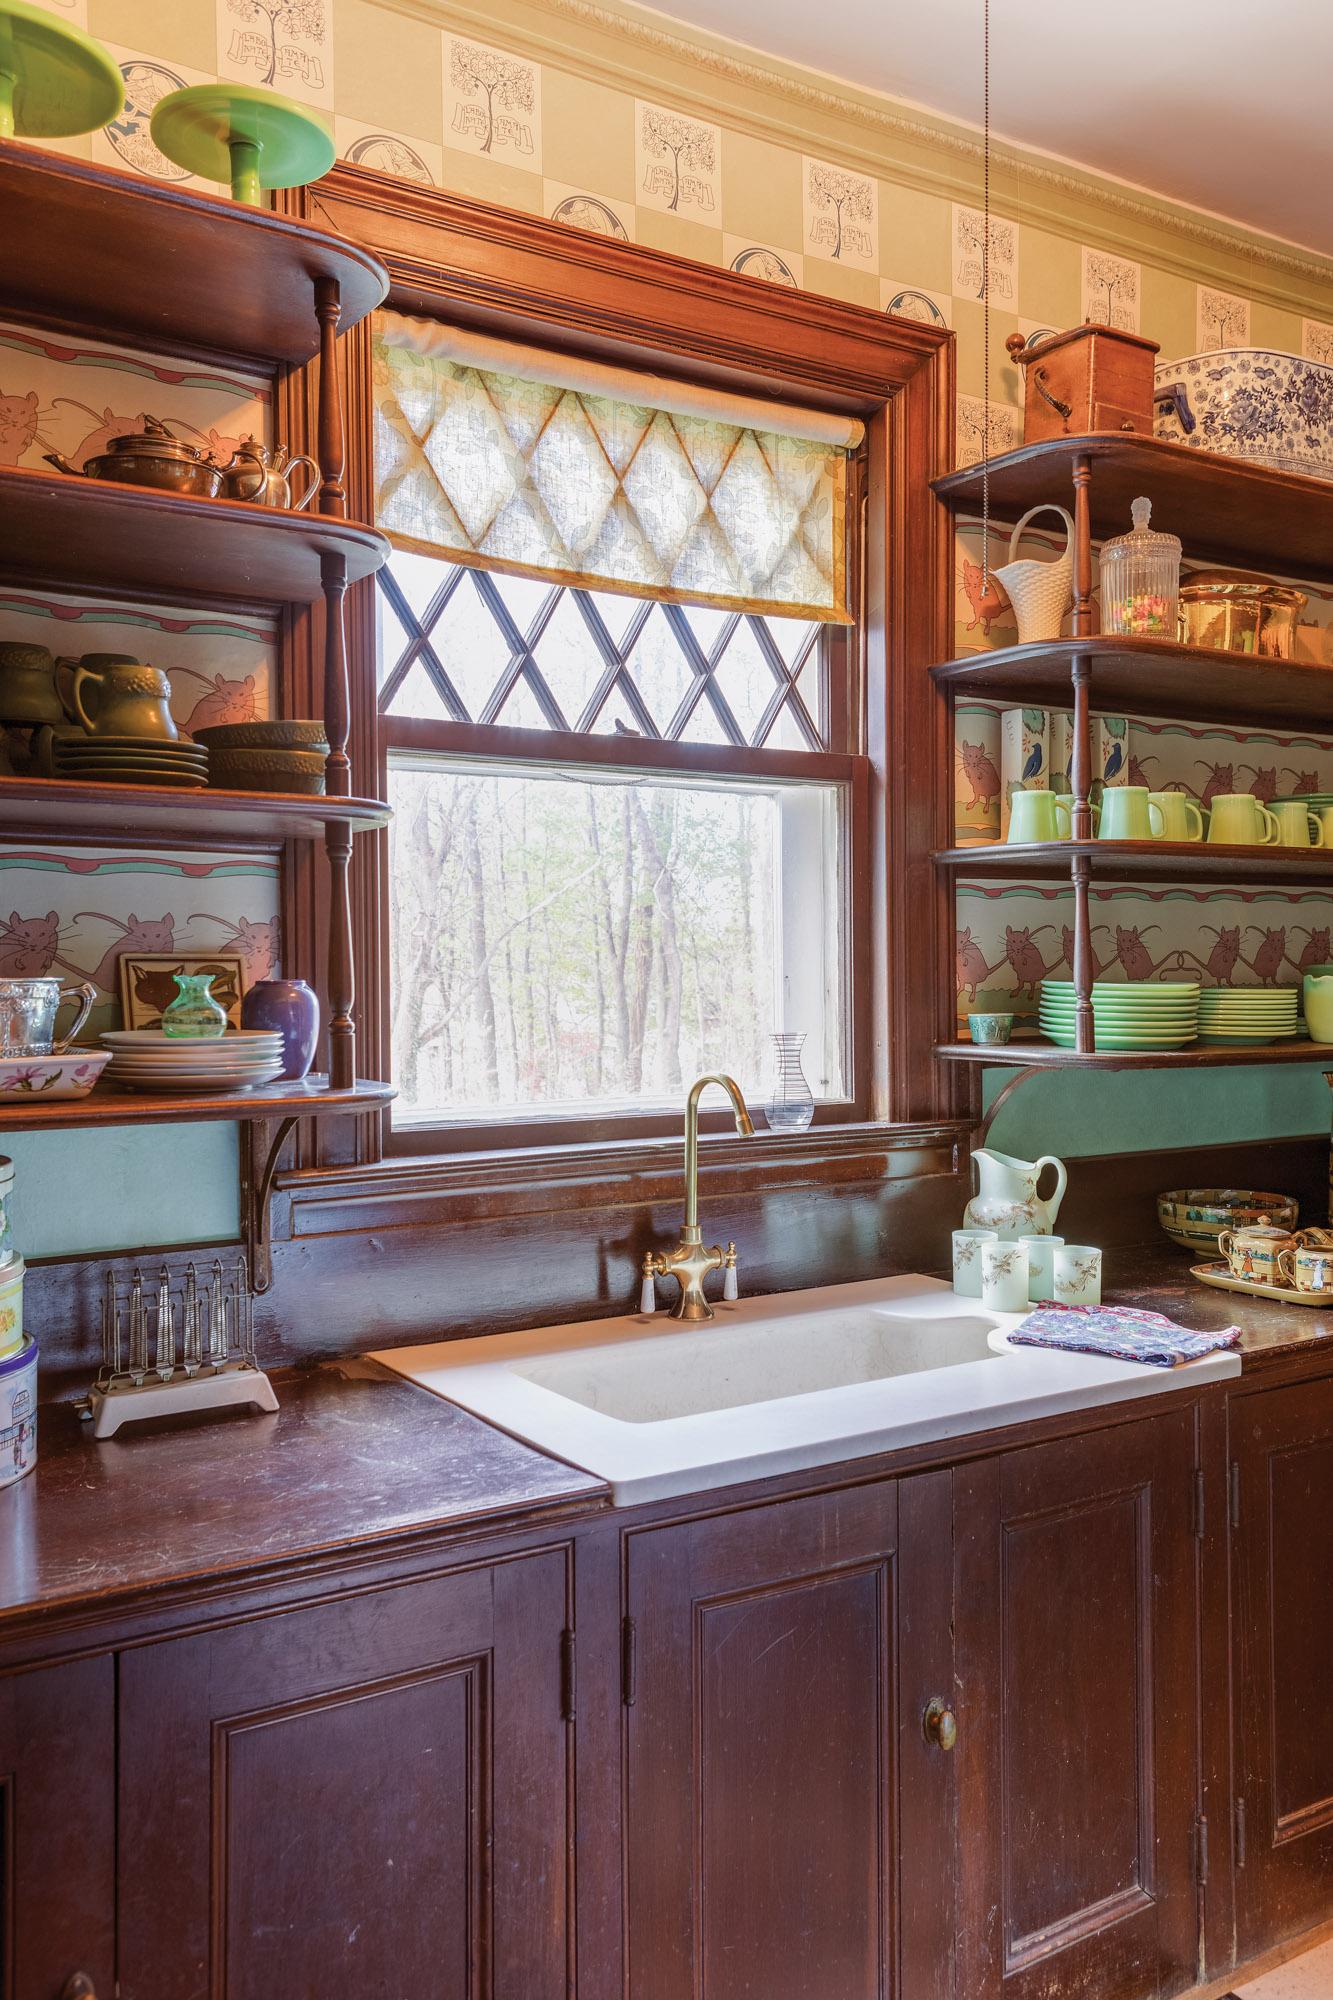 Woodwork in butler's pantries